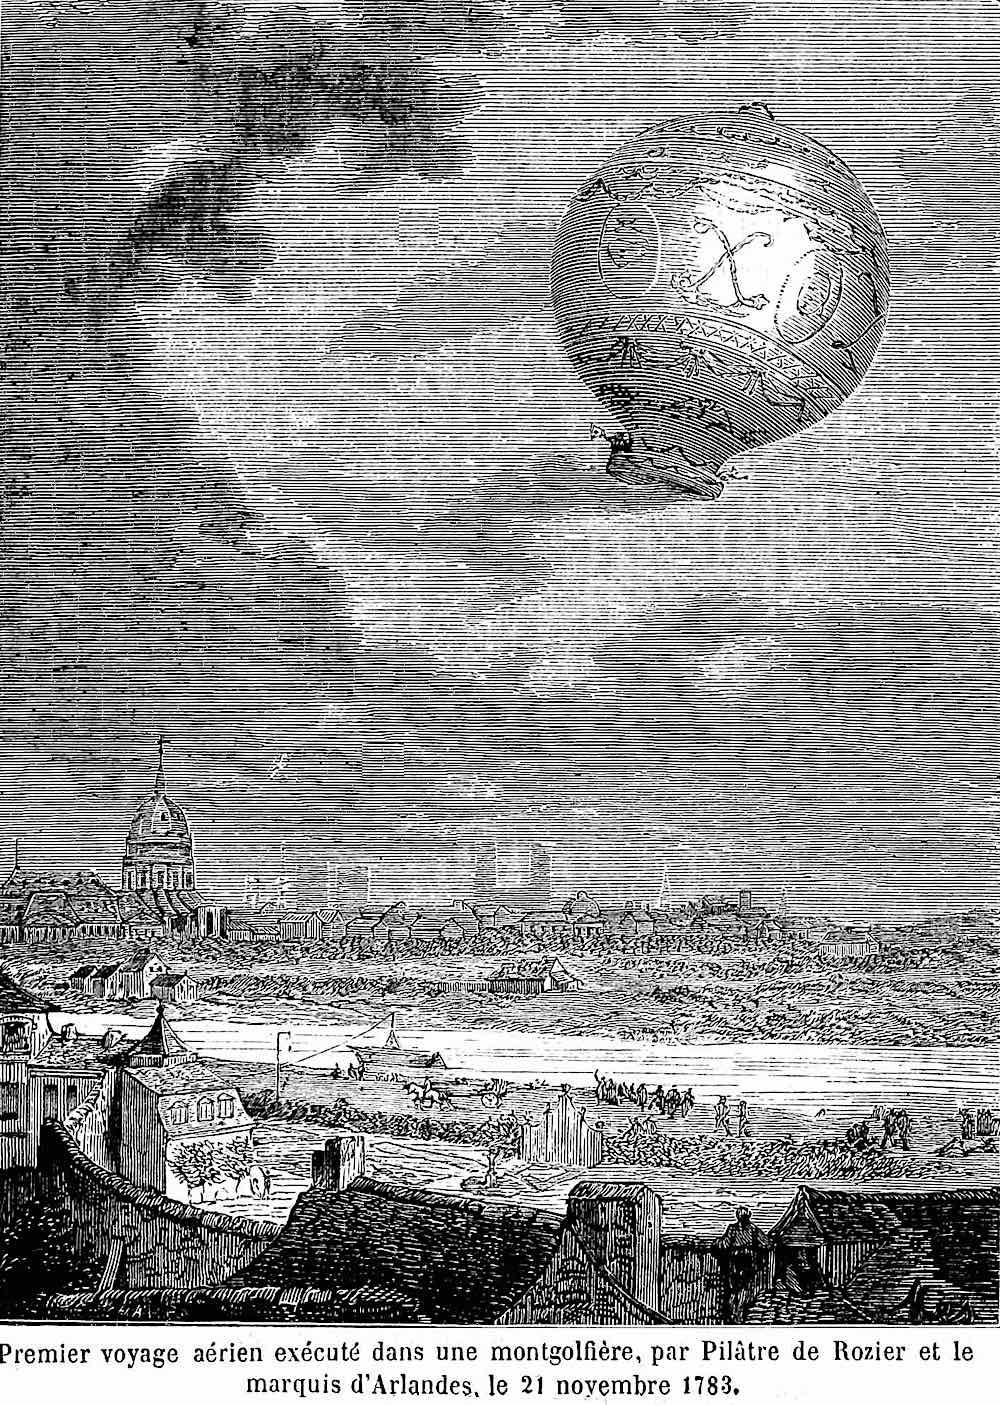 a 1783 balloon flight in France